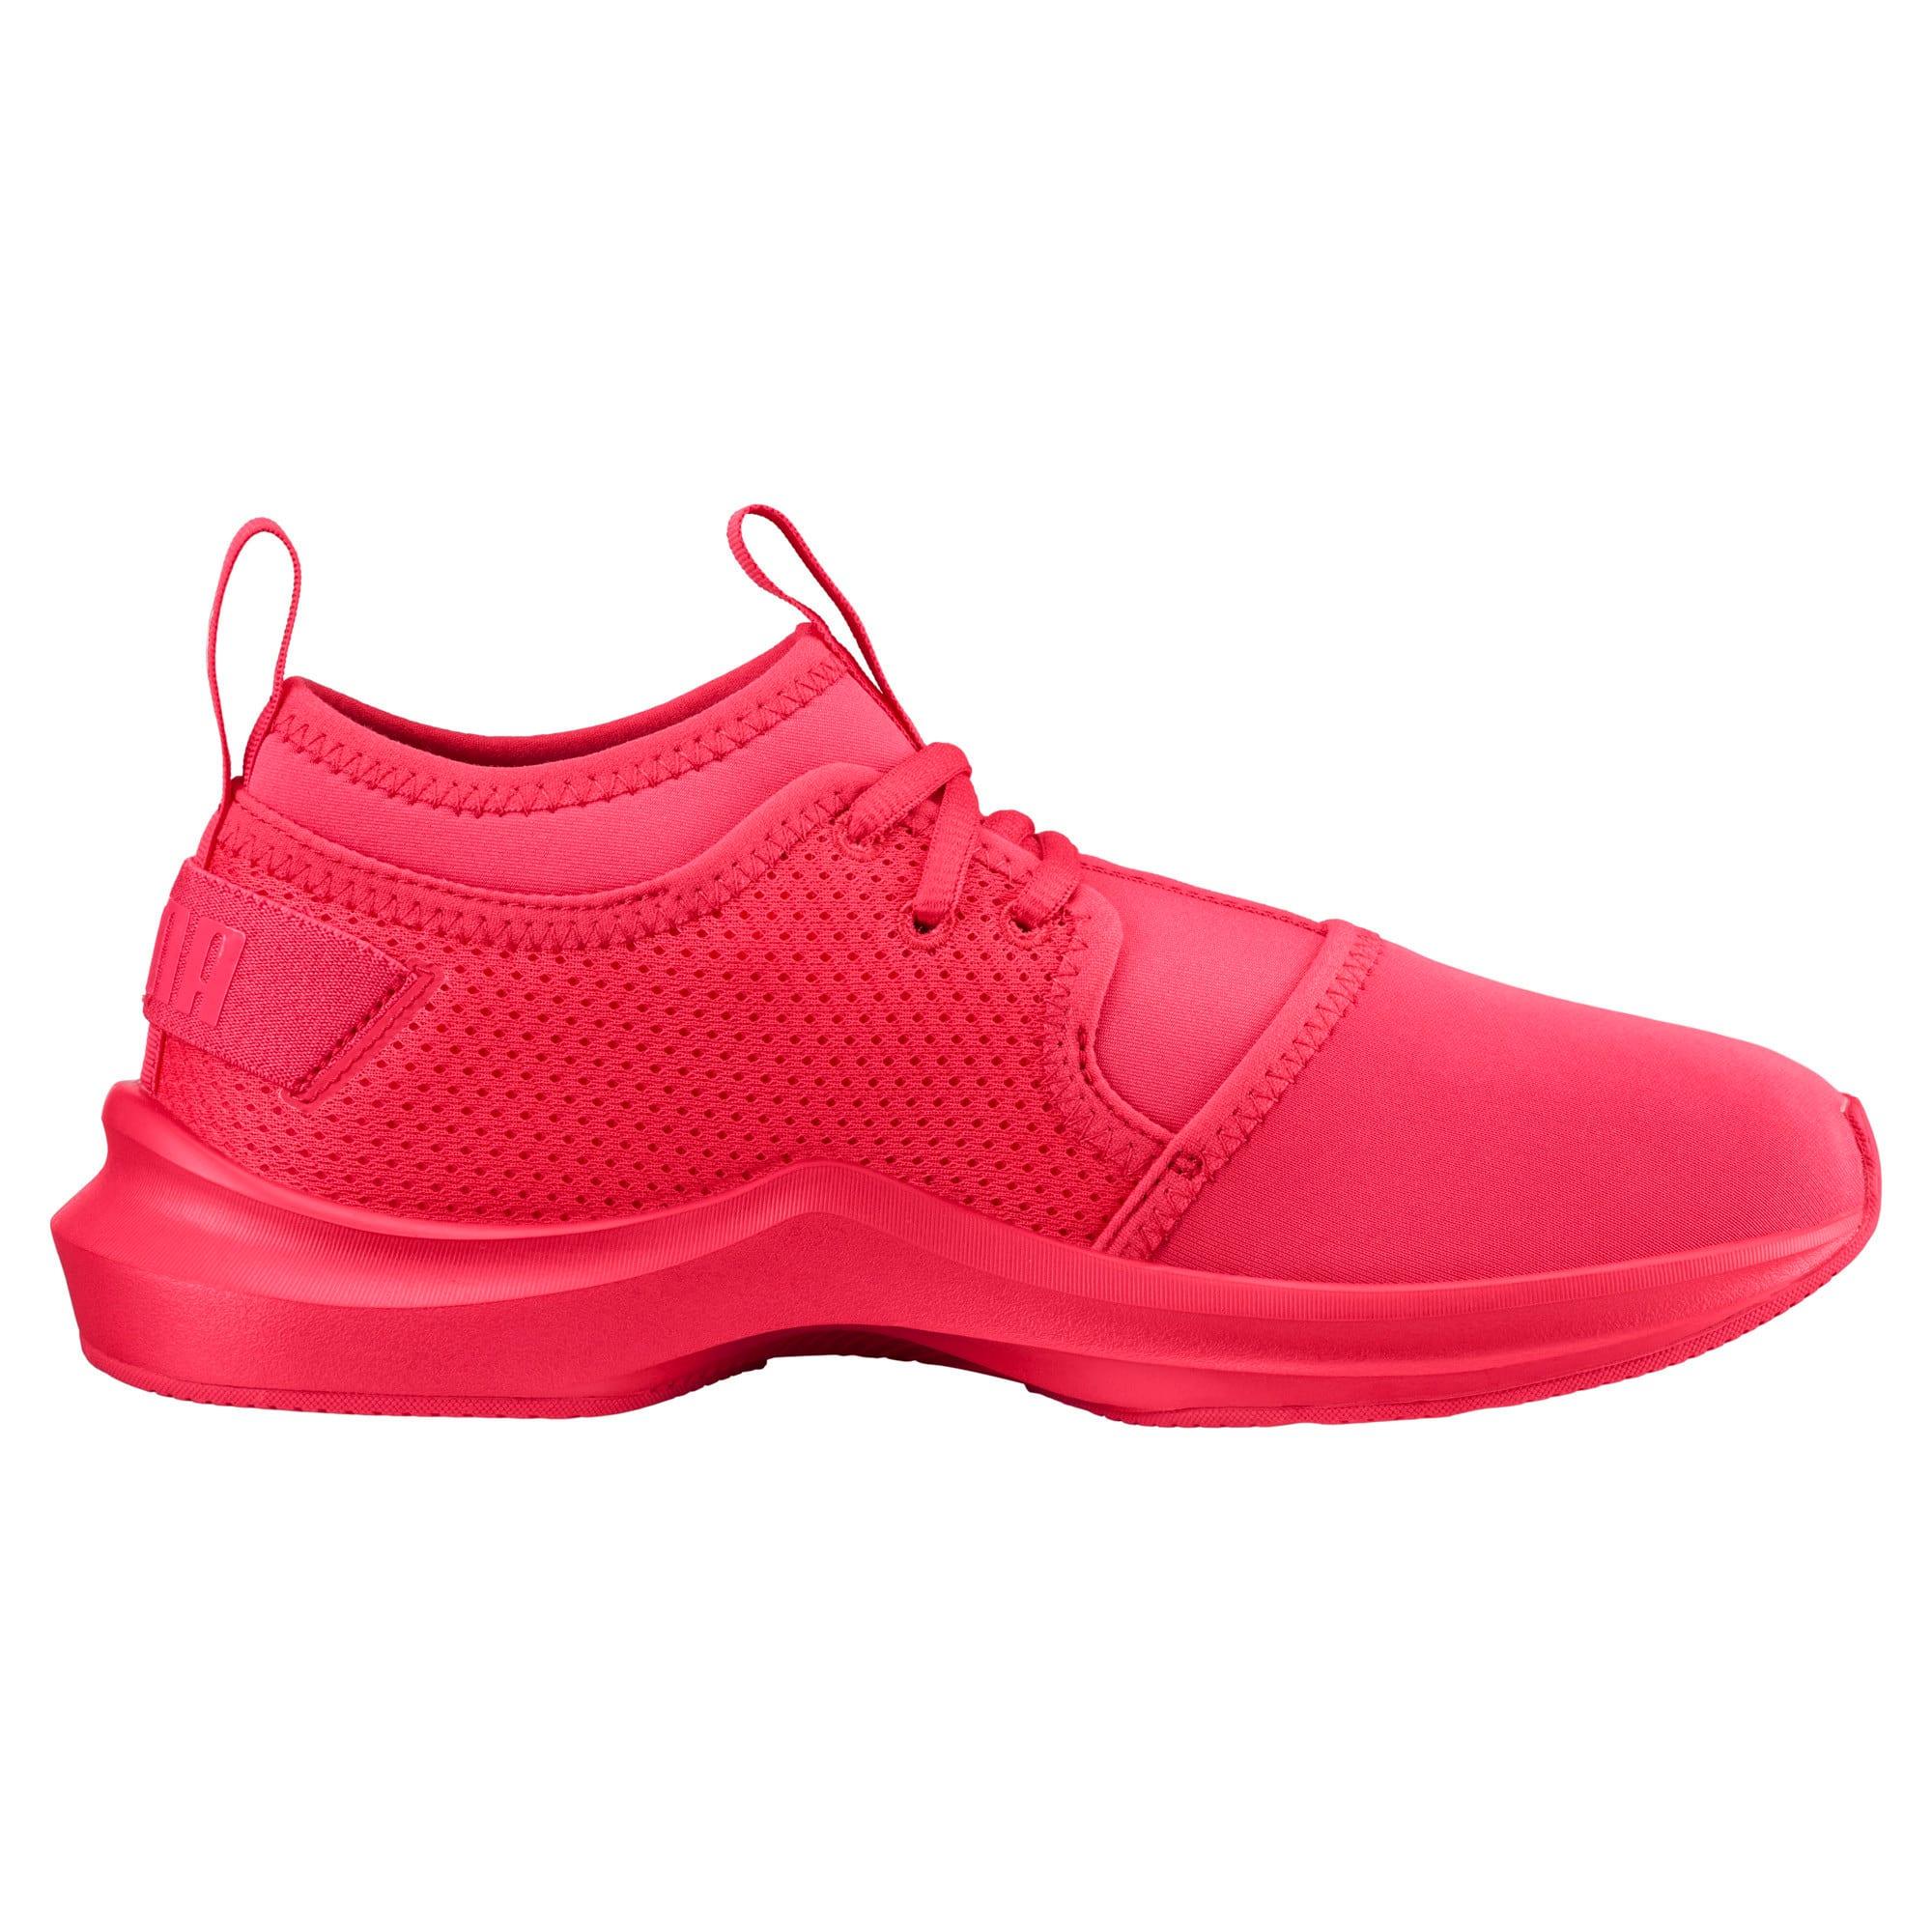 Thumbnail 3 of Phenom Lo Women's Training Shoes, Paradise Pink-Paradise Pink, medium